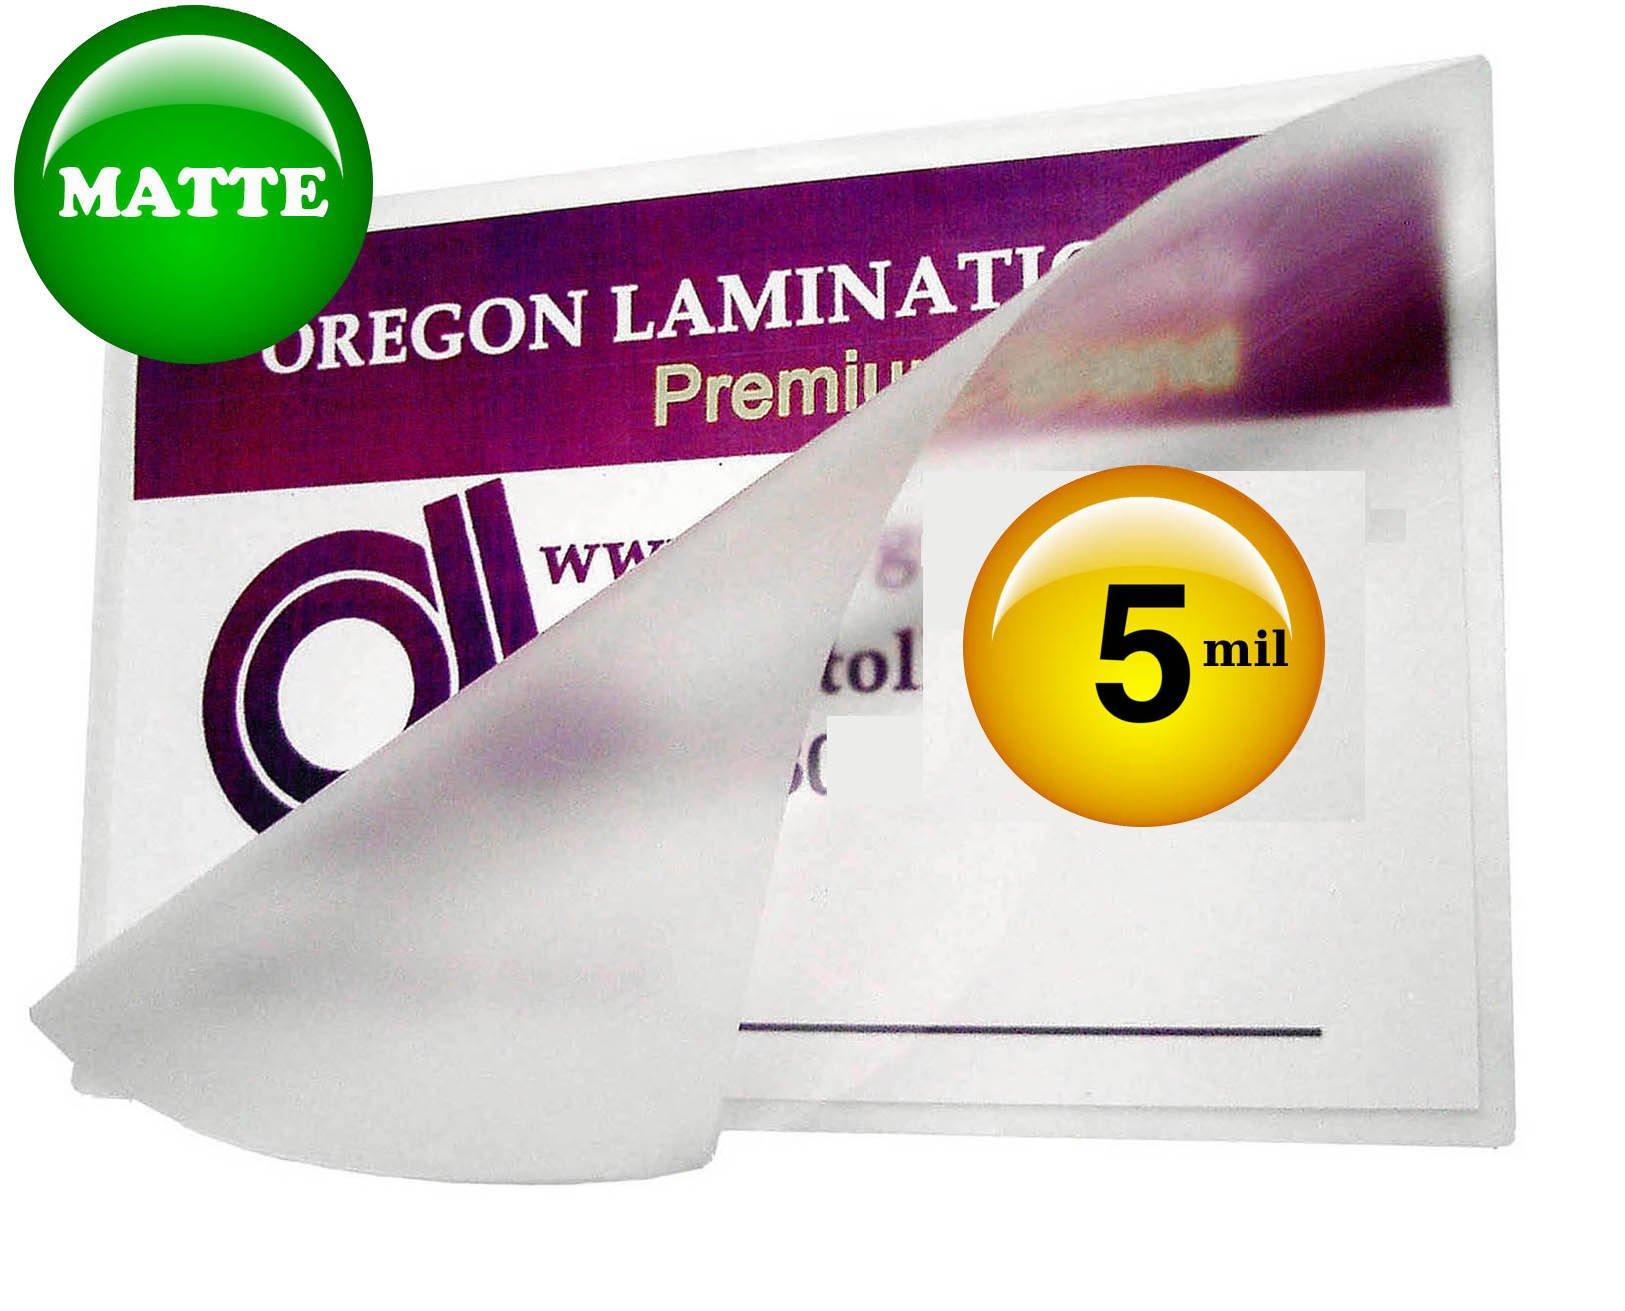 Oregon Lamination Hot Laminating Pouches Letter (Pack of 200) 5 Mil 9 x 11-1/2-inch Matte/Matte by Oregon Lamination Premium